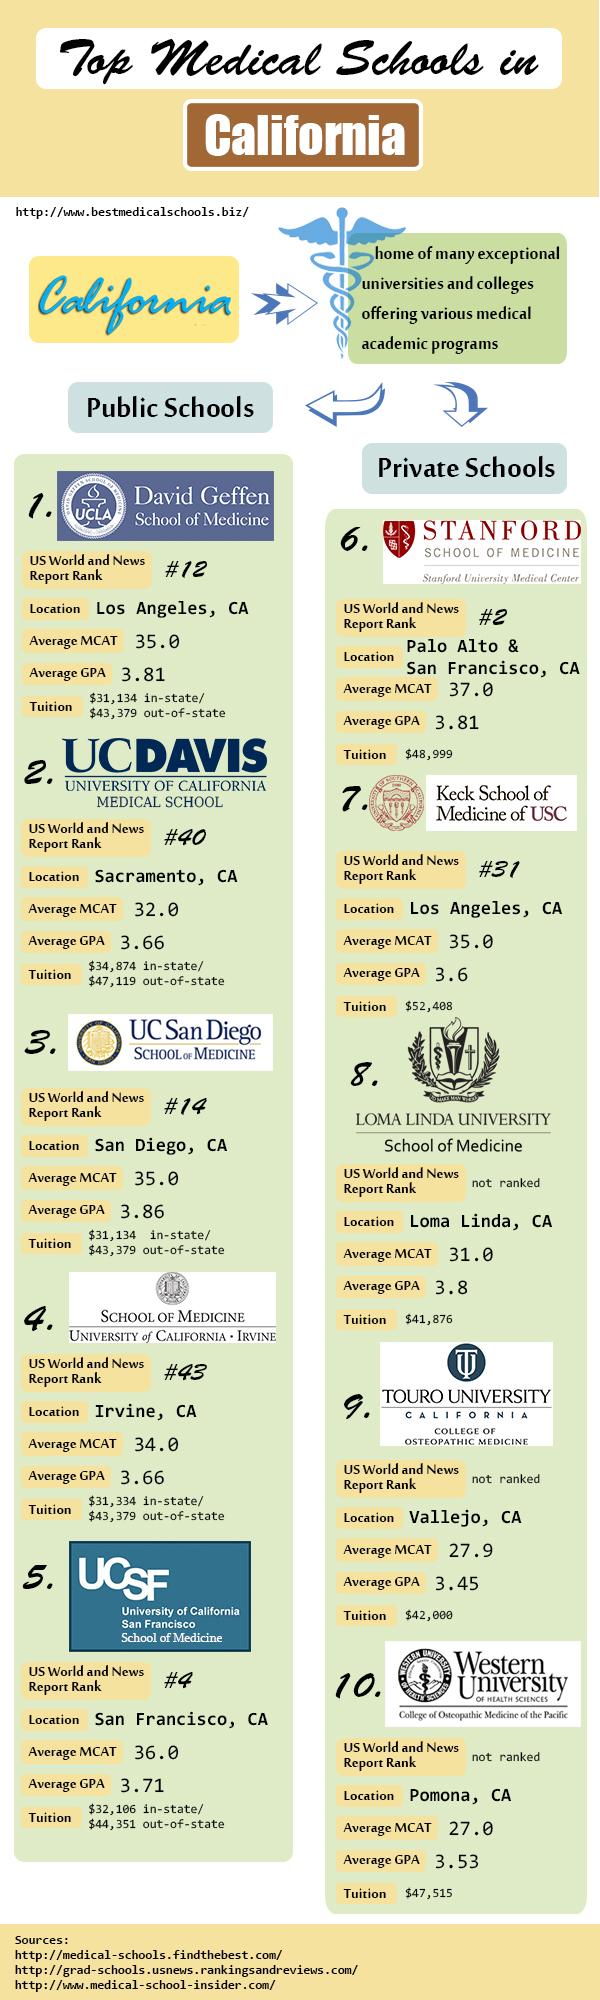 top medical schools on california infographics